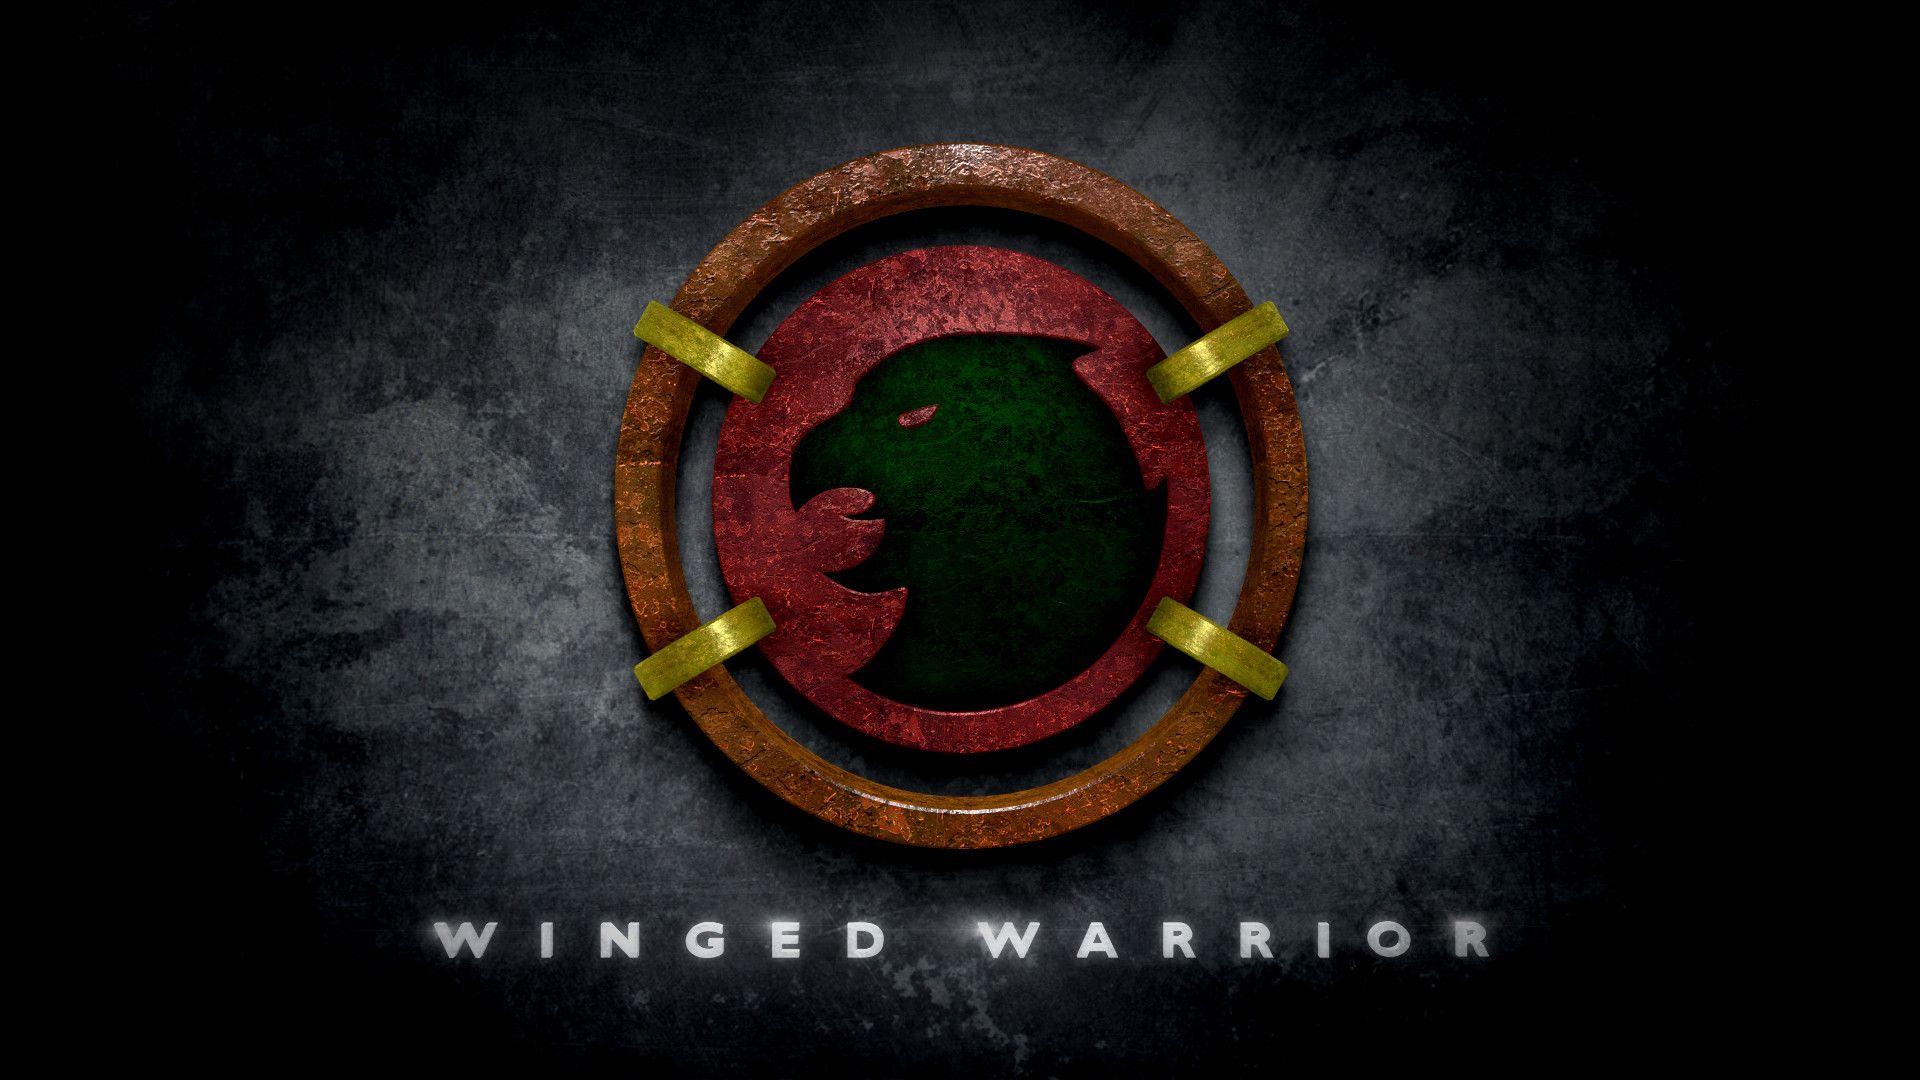 Hawkman Justice League Logos In The Style Of Man Of Steel Imgur Justice League Logo Man Of Steel Superhero Pop Art